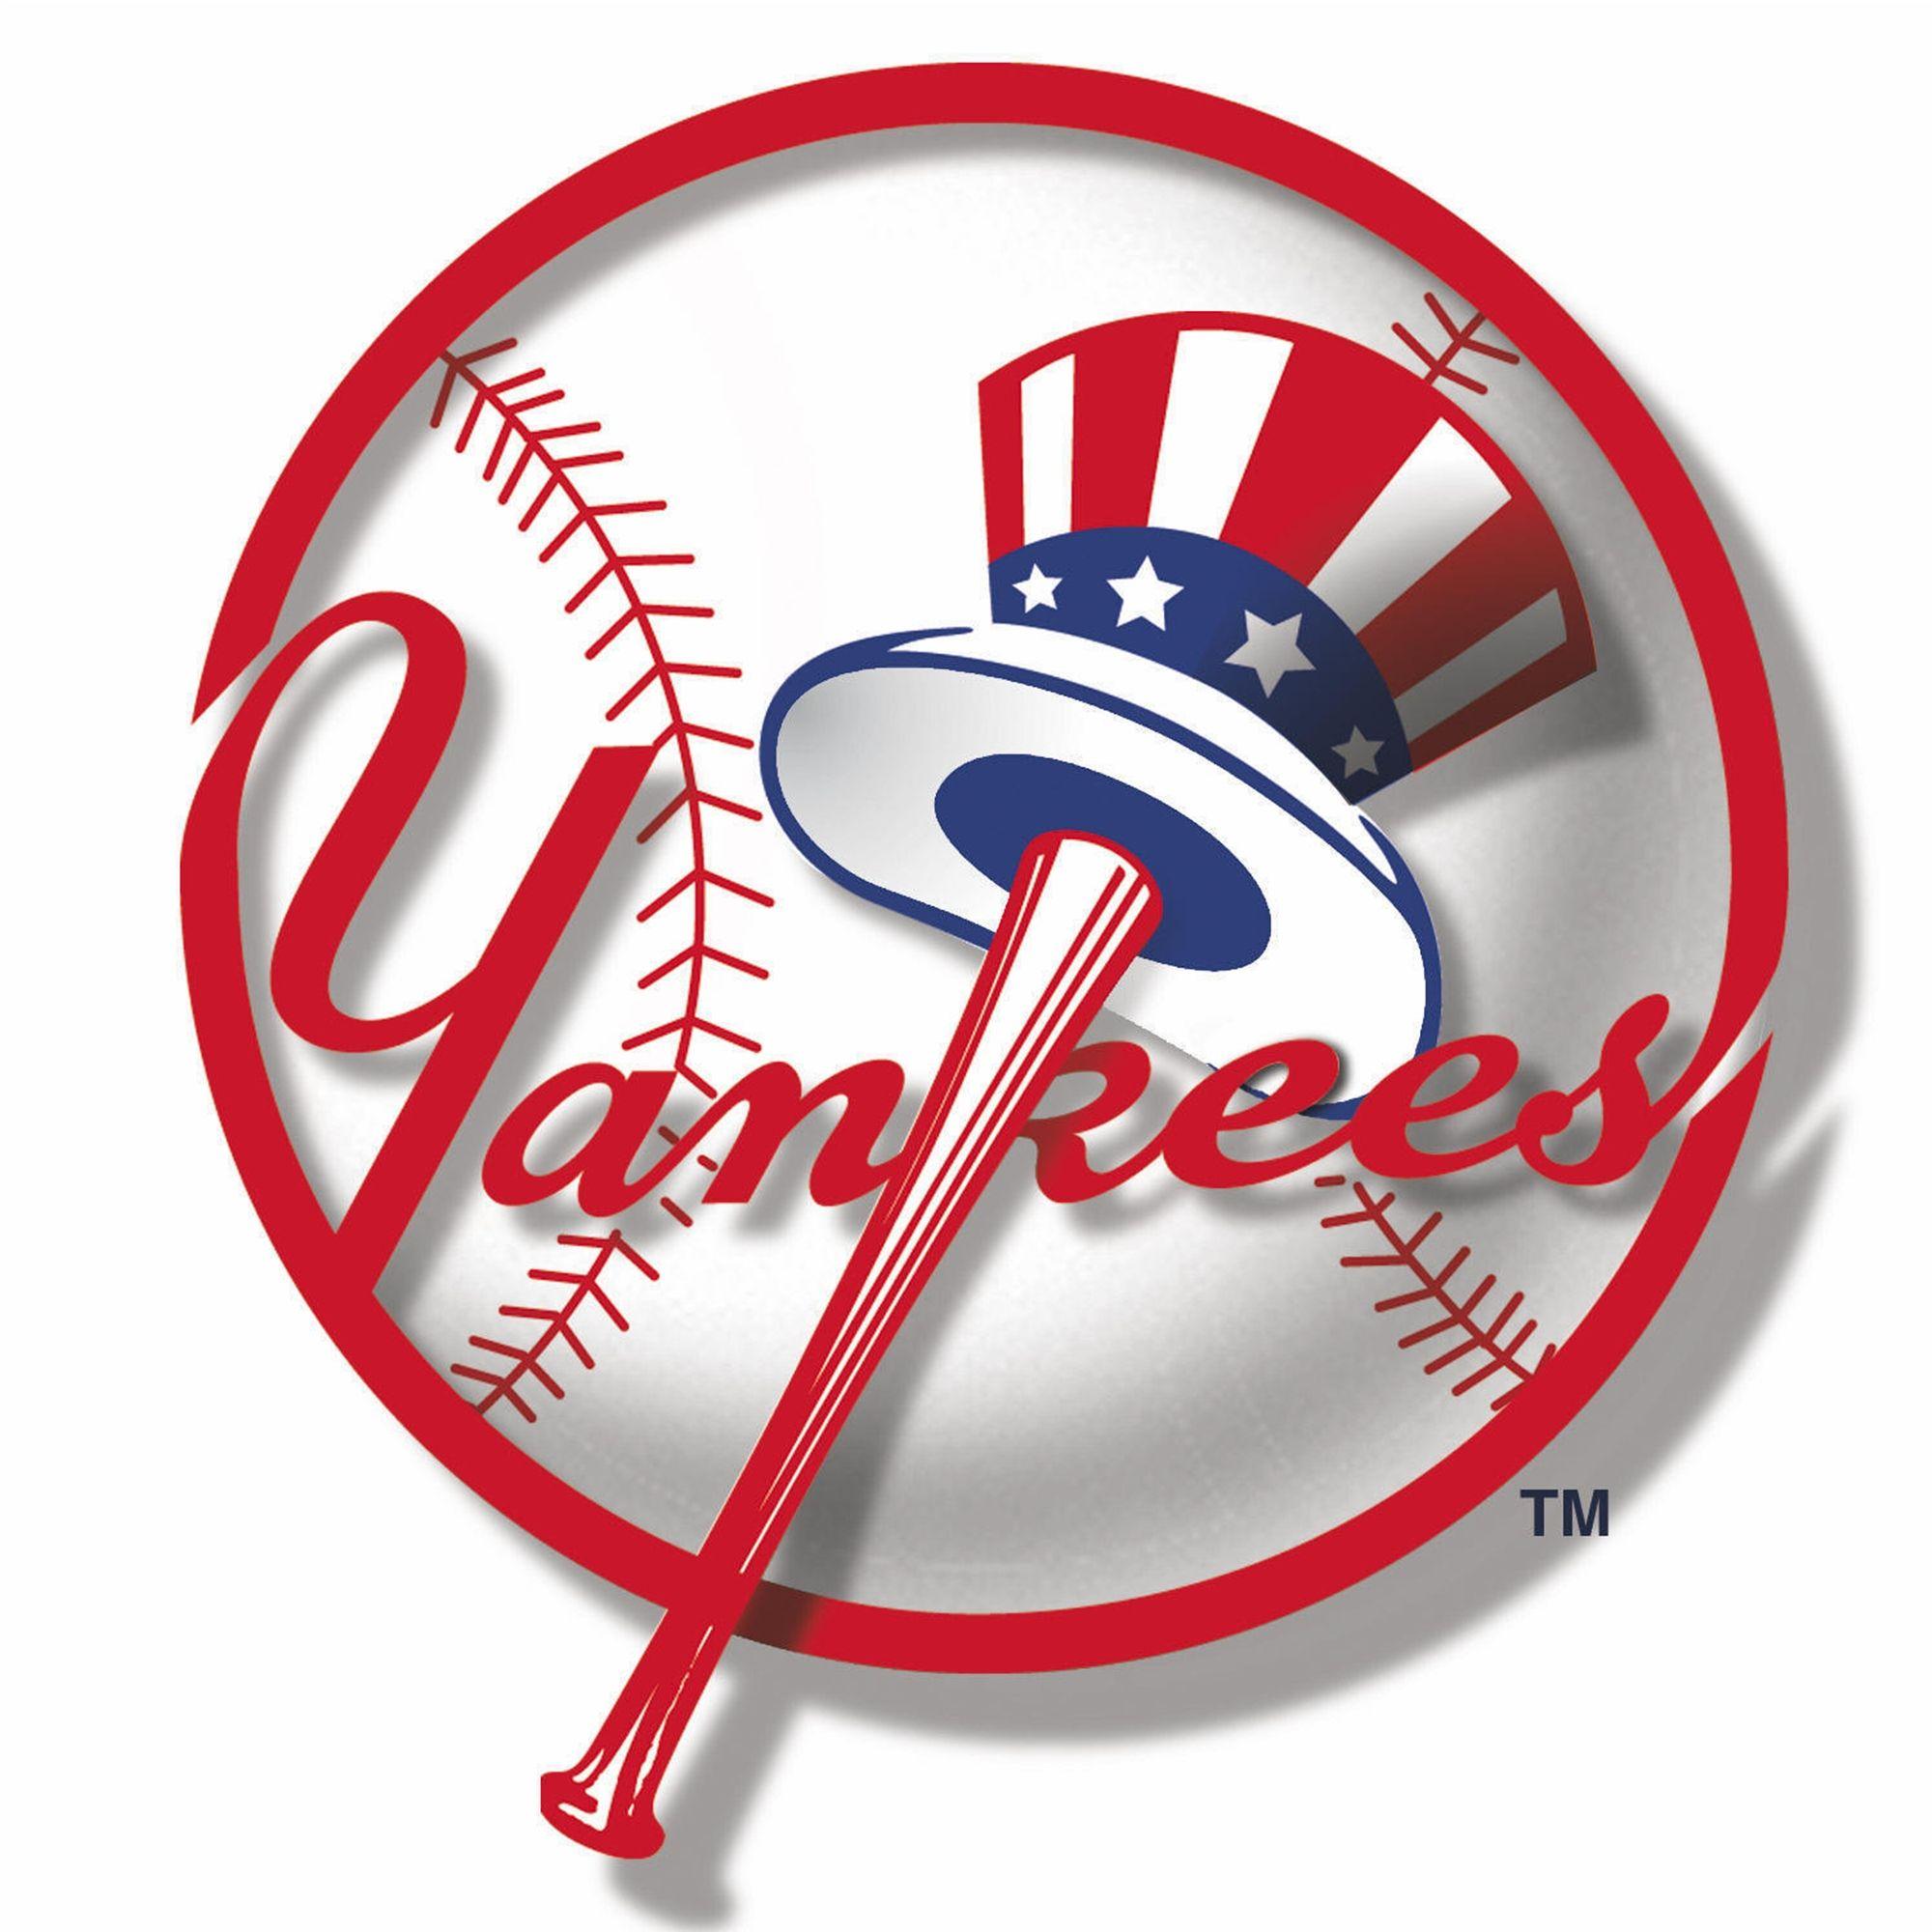 Yankees Jpg Yahoo Image Search Results Ny Yankees Logo New York Yankees Logo New York Yankees Baseball